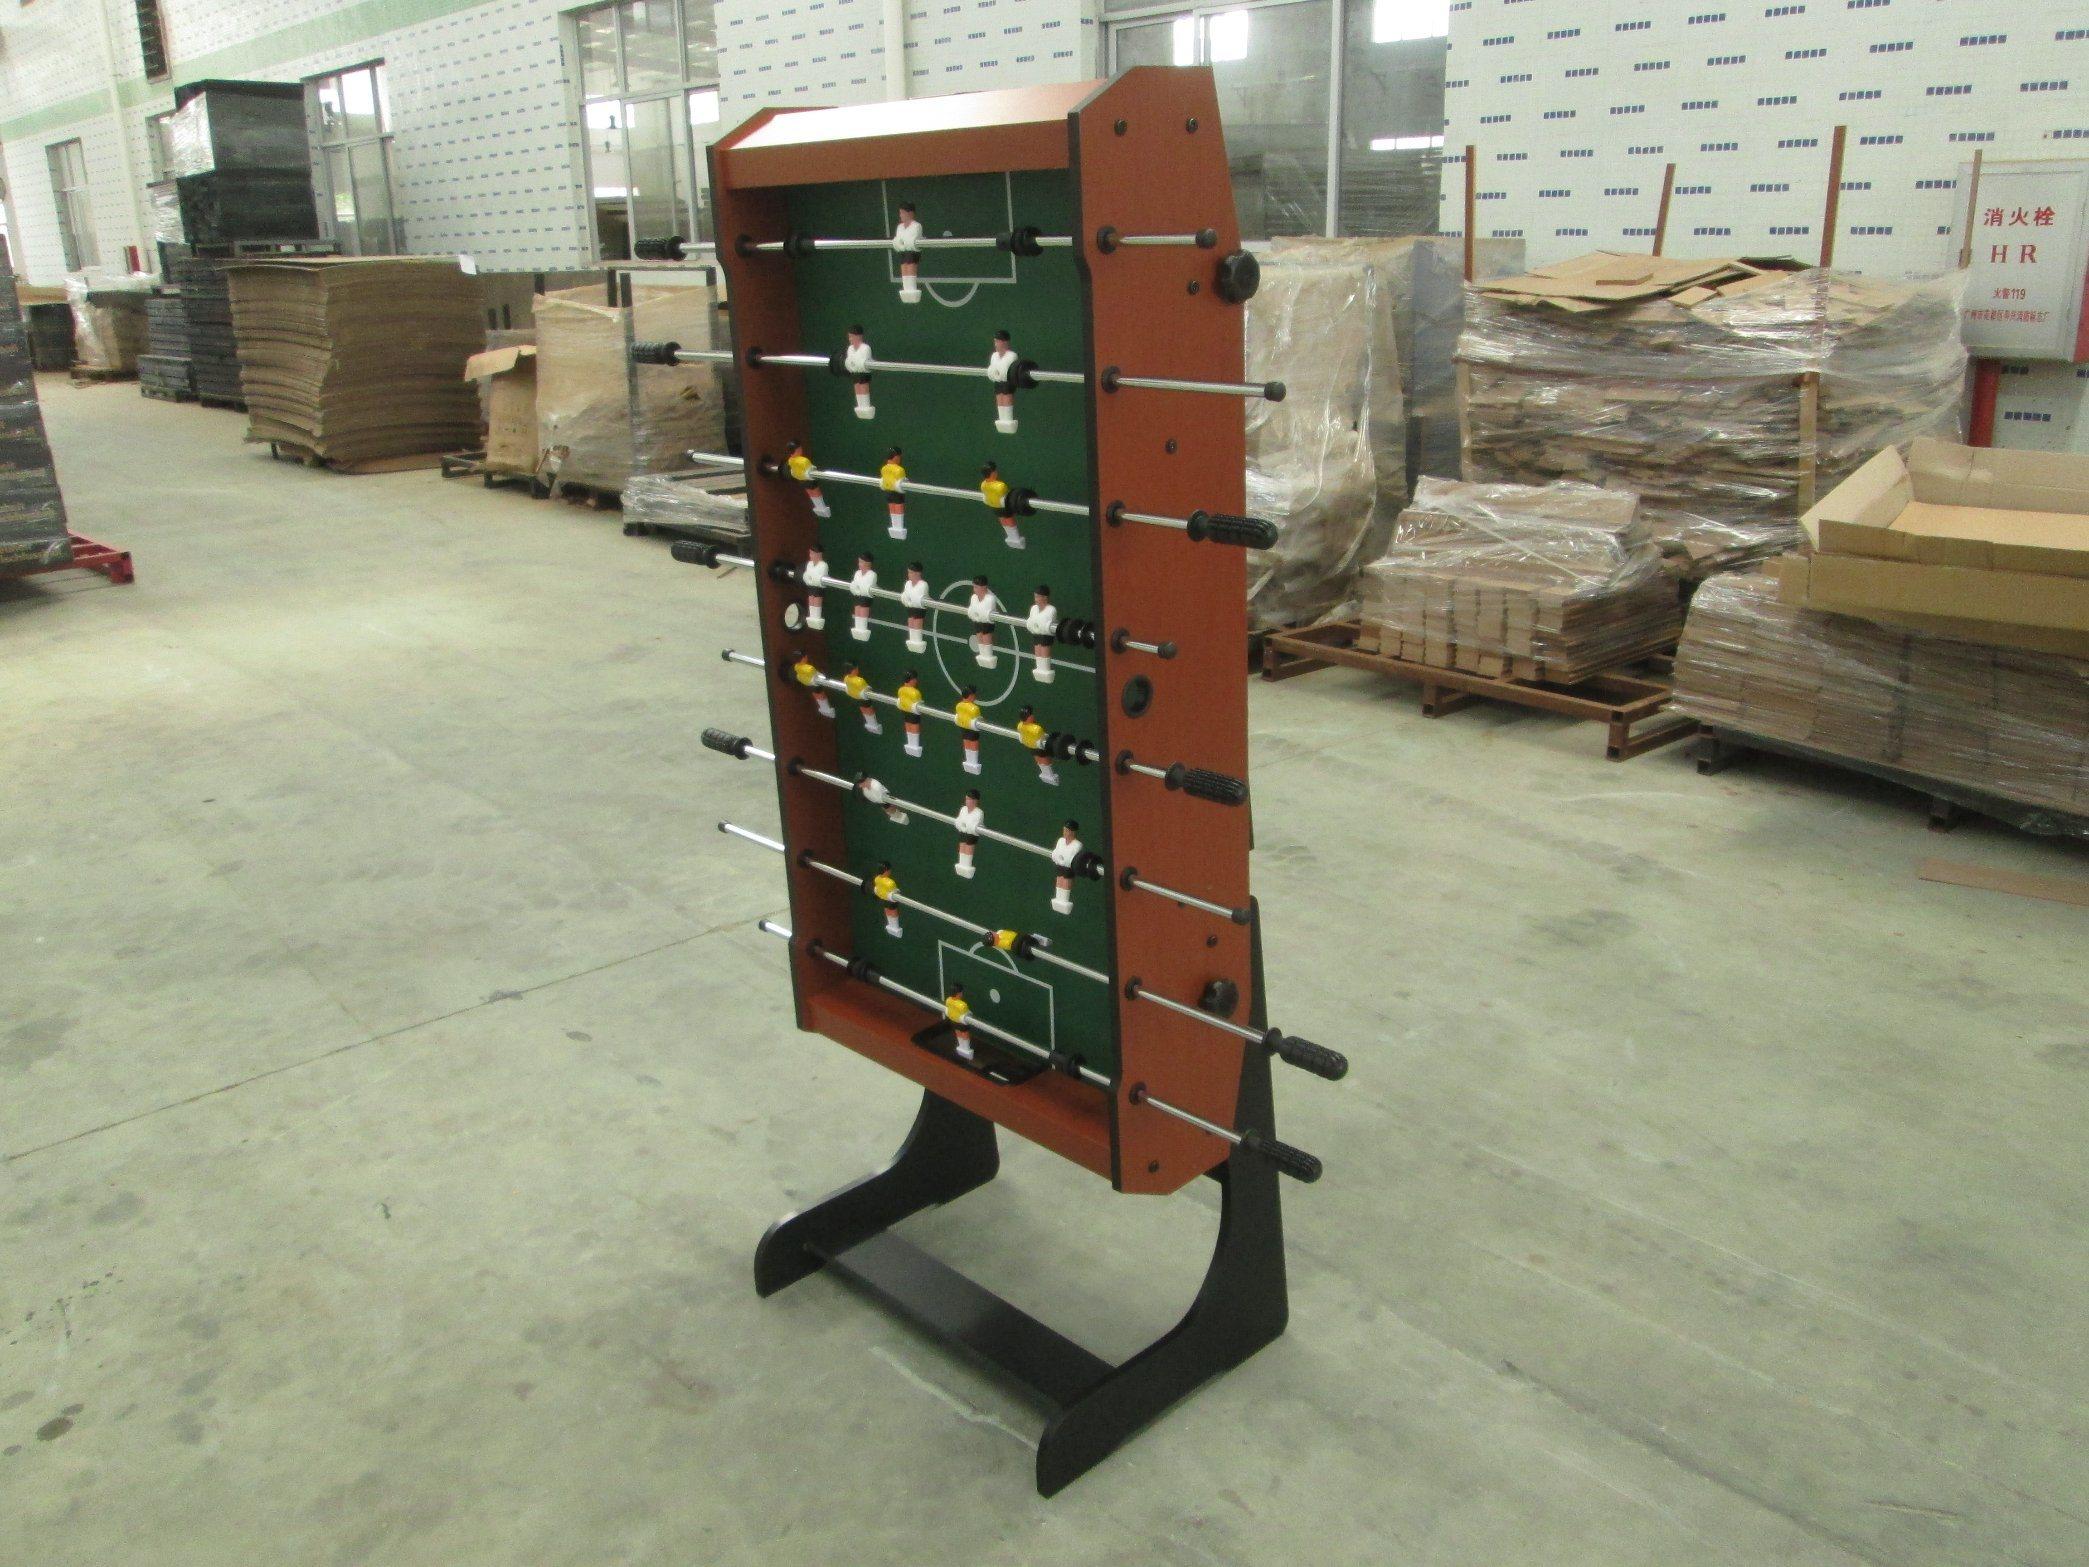 Folding Soccer Game Table